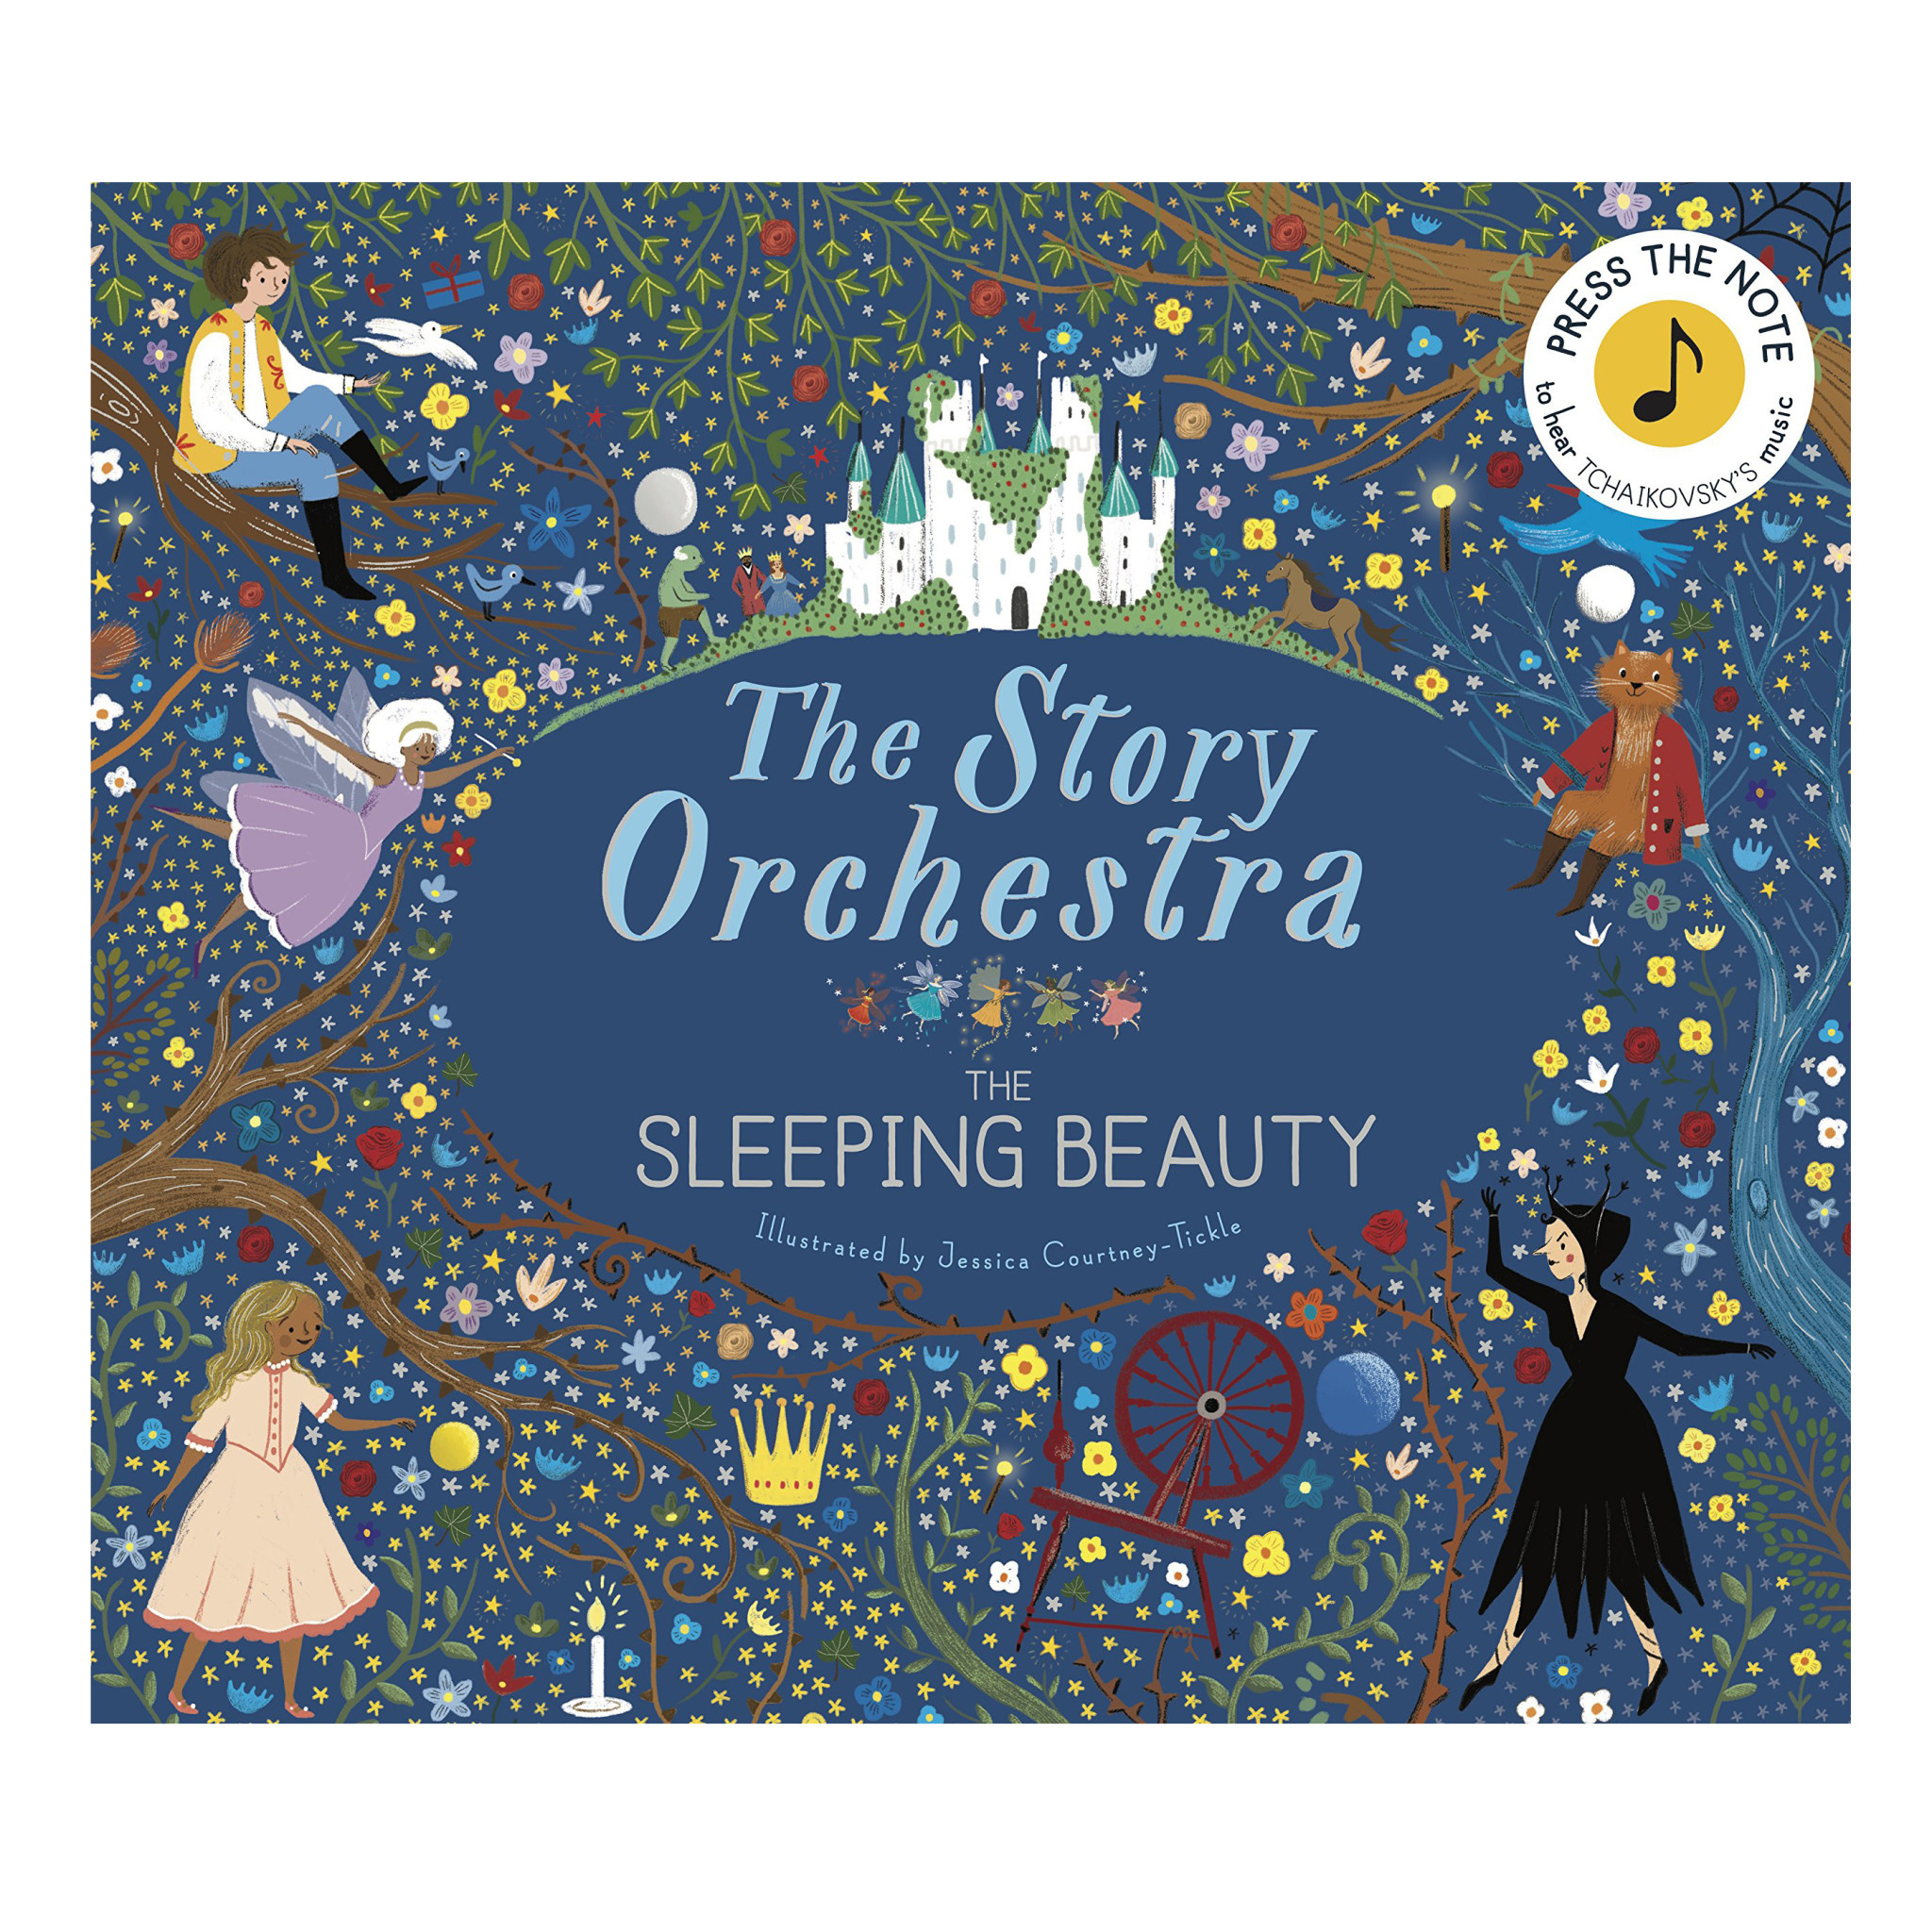 Quarto The Story Orchestra: The Sleeping Beauty